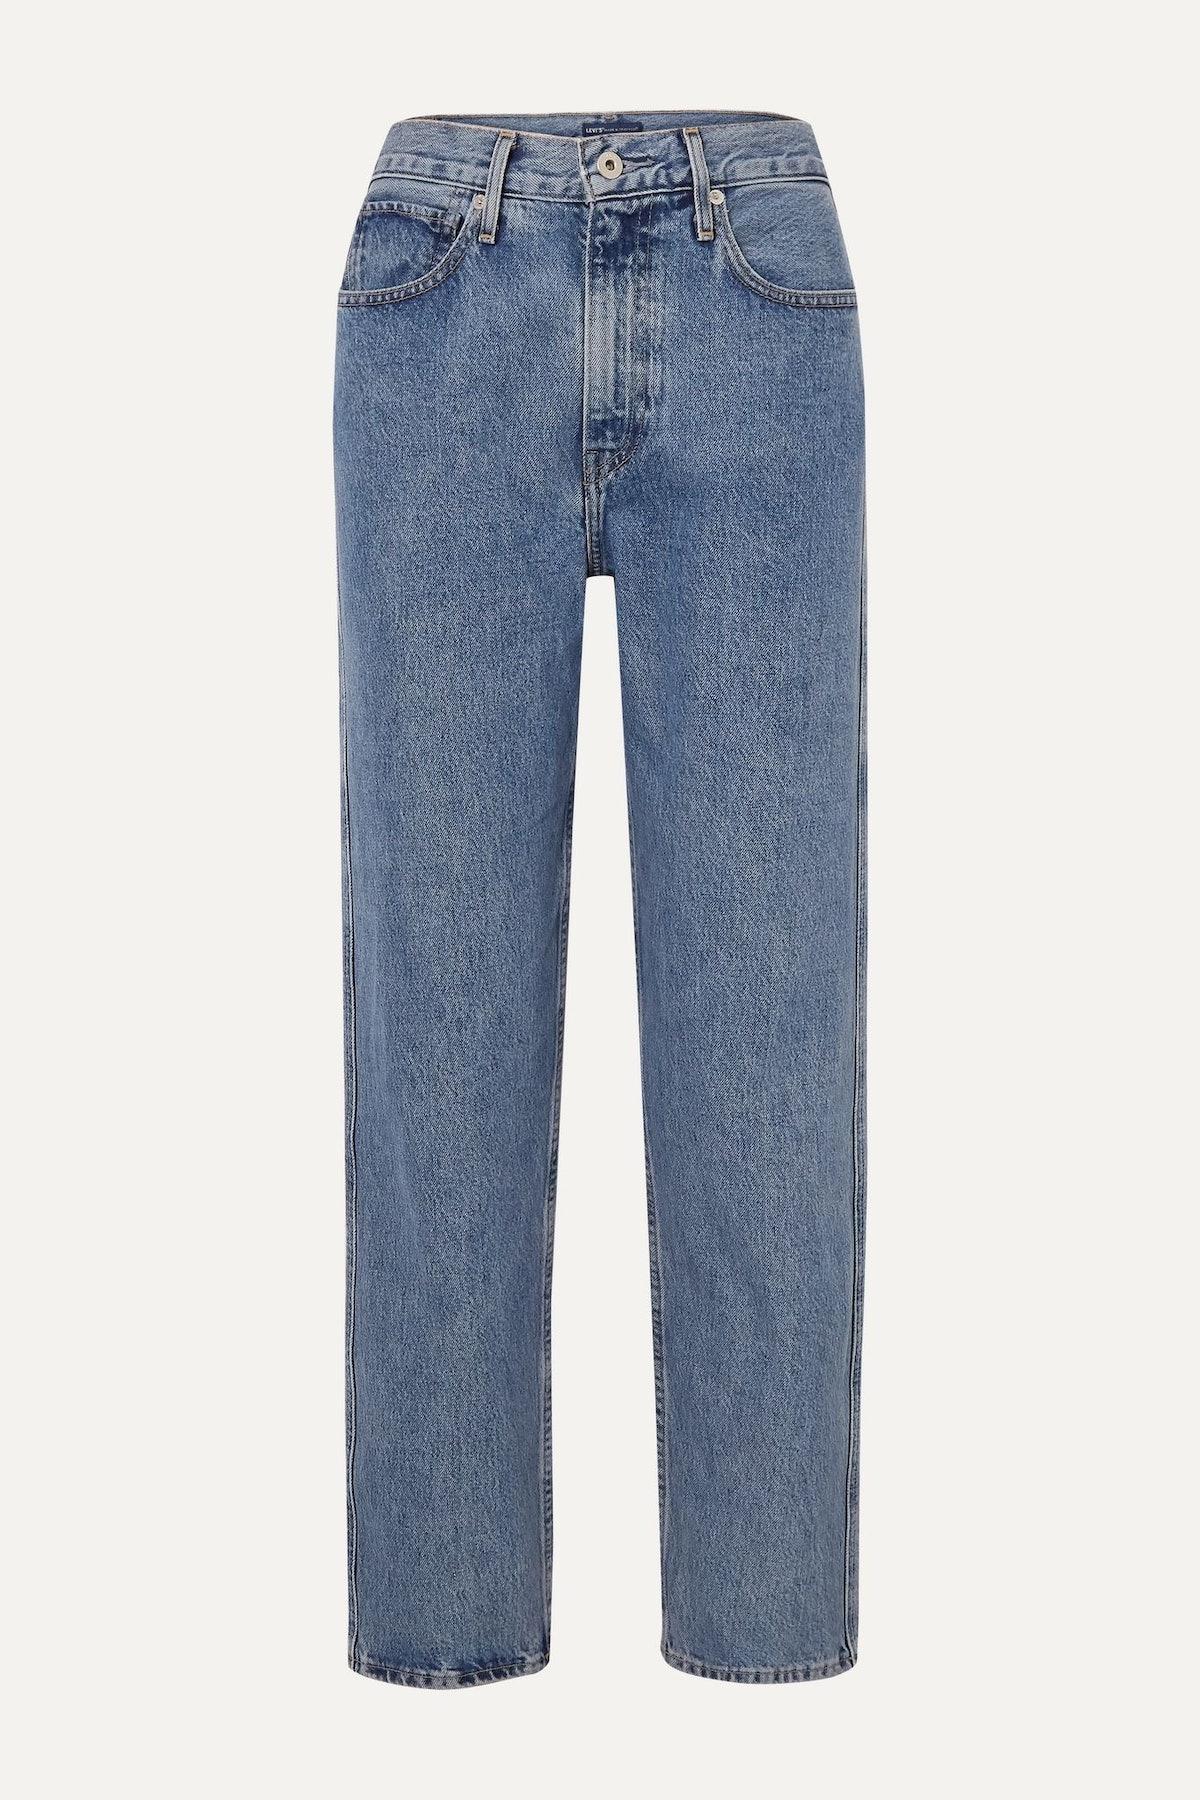 The Column Women's Jeans